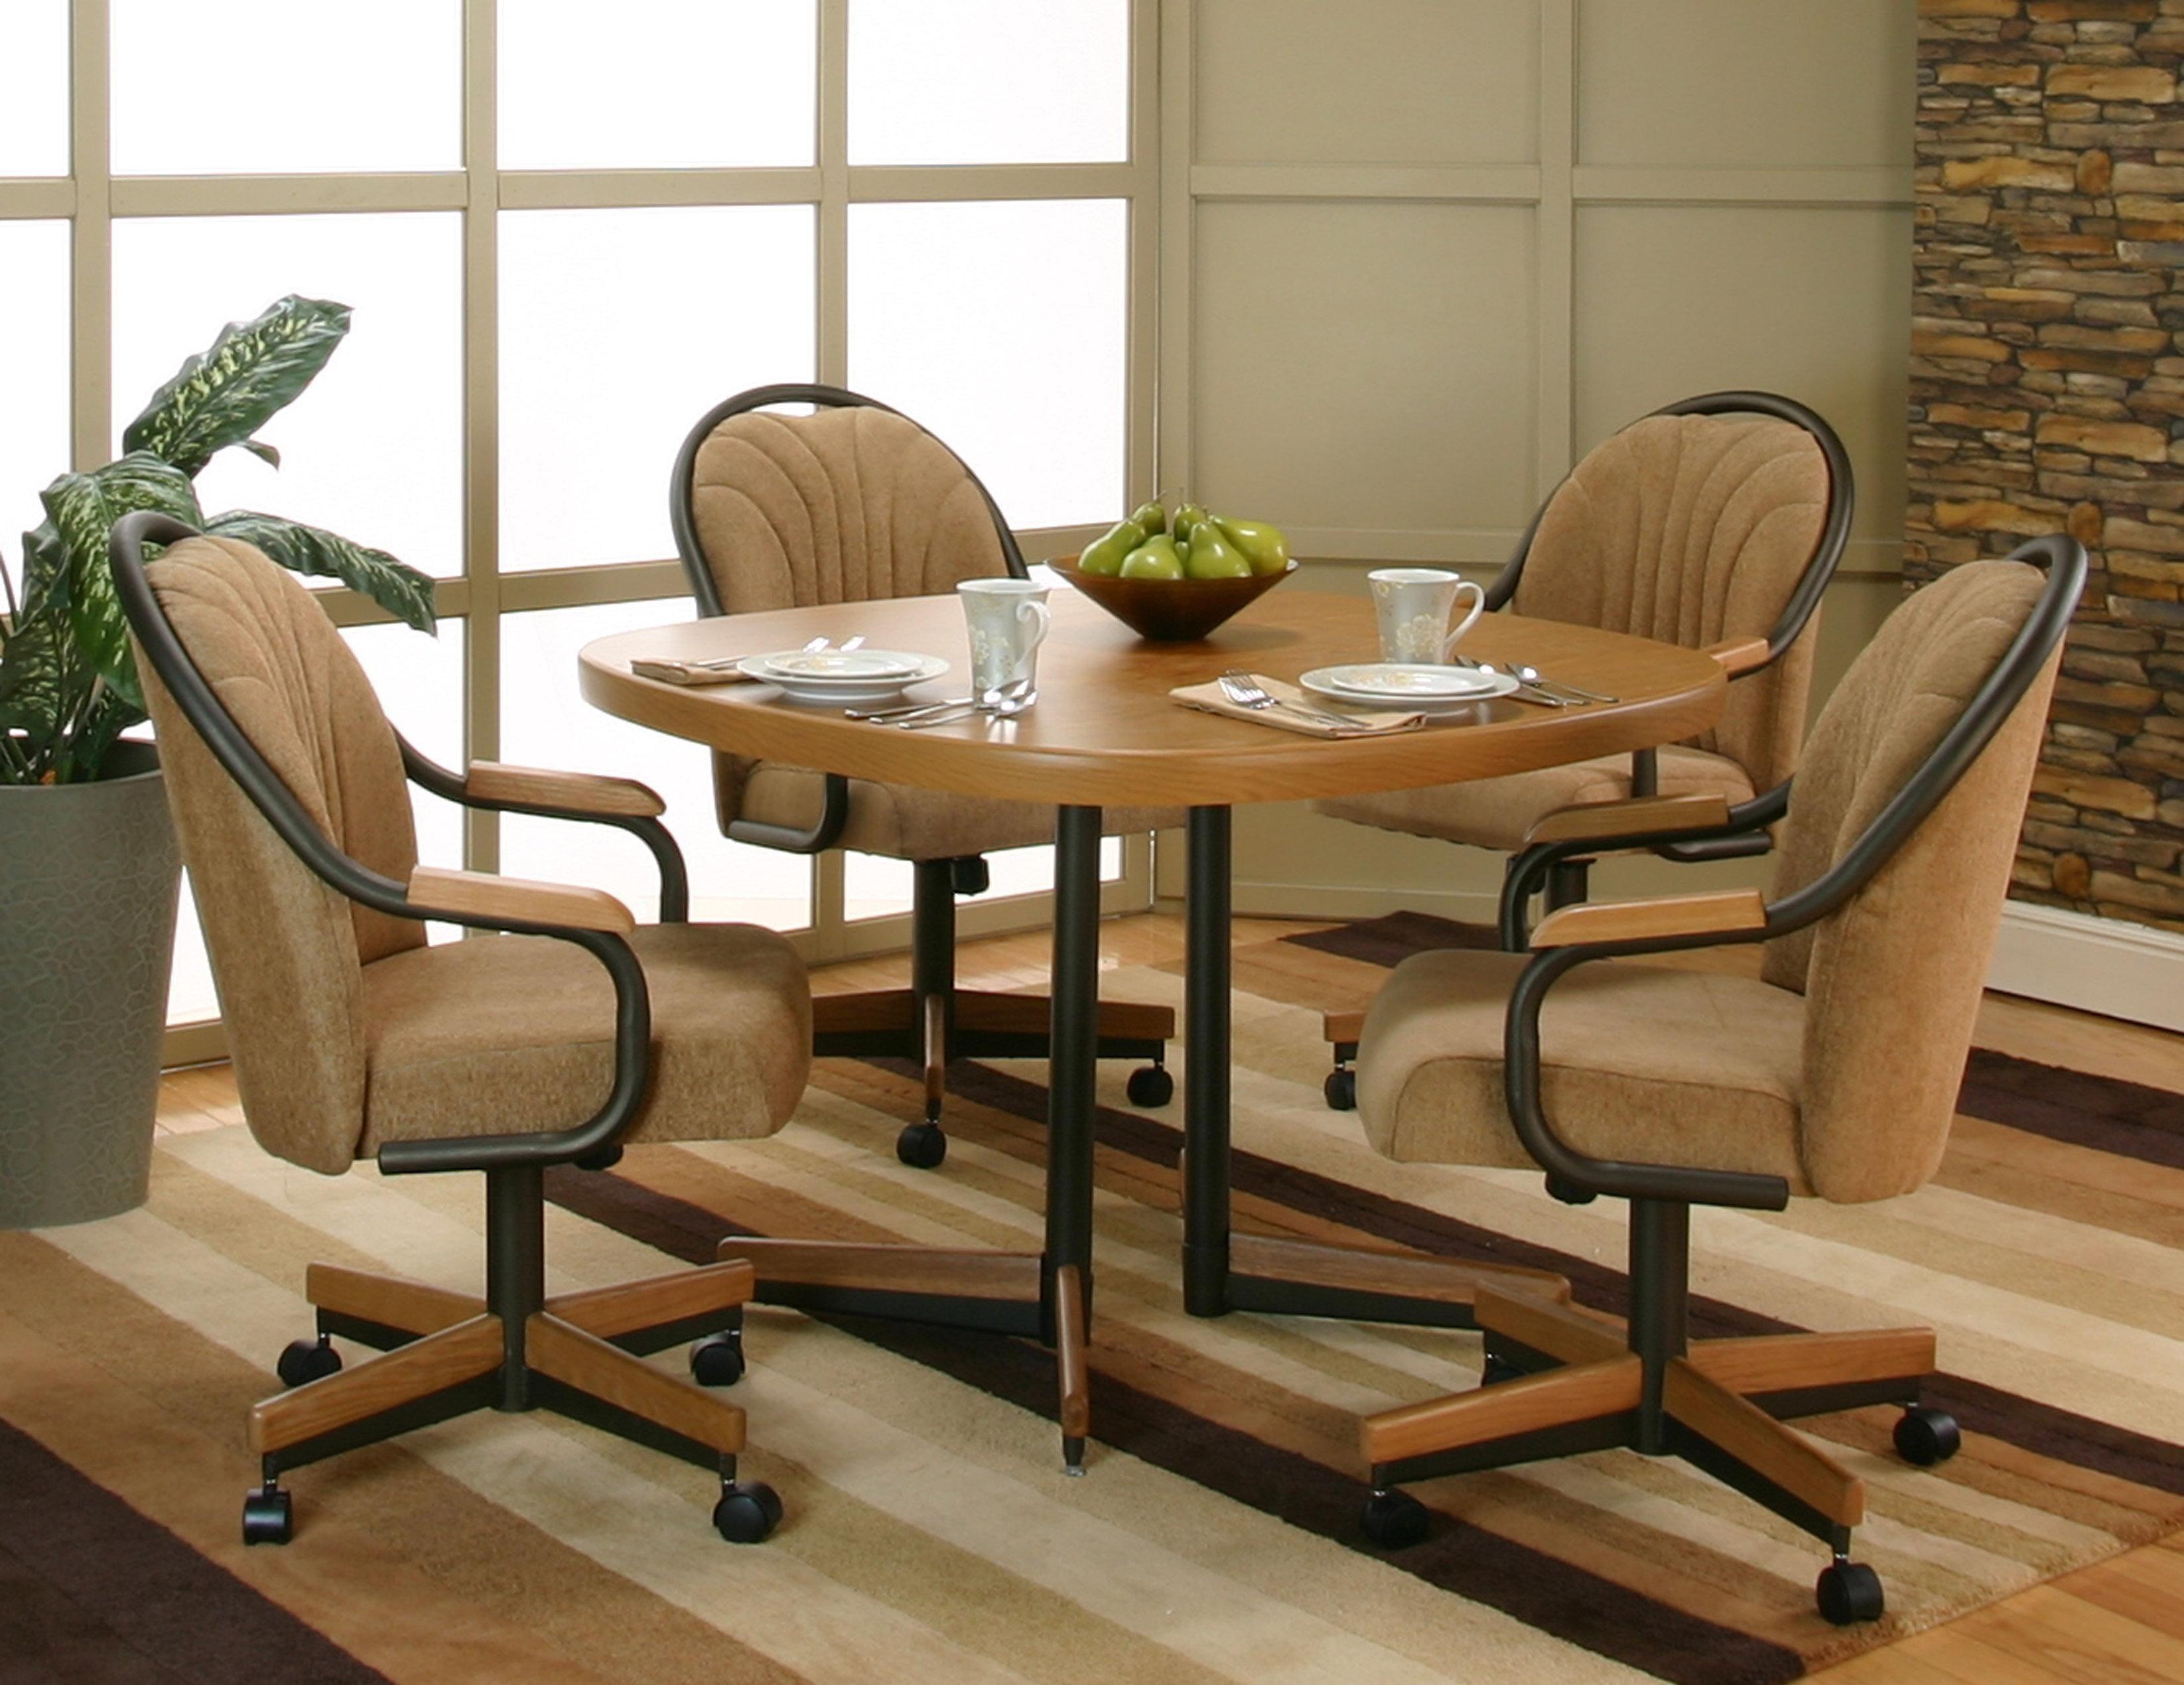 Kitchen Swivel Chairs Upholstered | http://sodakaustica.com ...